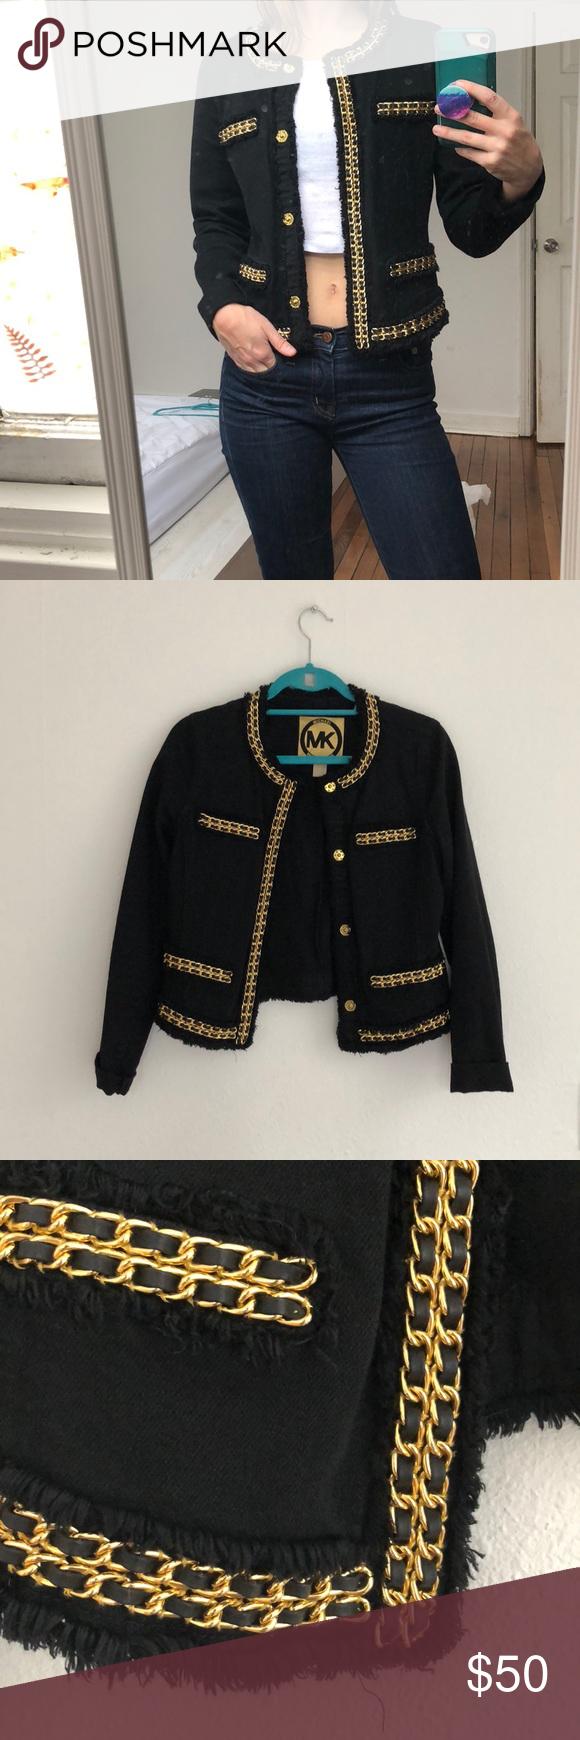 9f61dc1d6 Michael Kors Denim Jacket Michael Kors Black Denim Jacket with ...